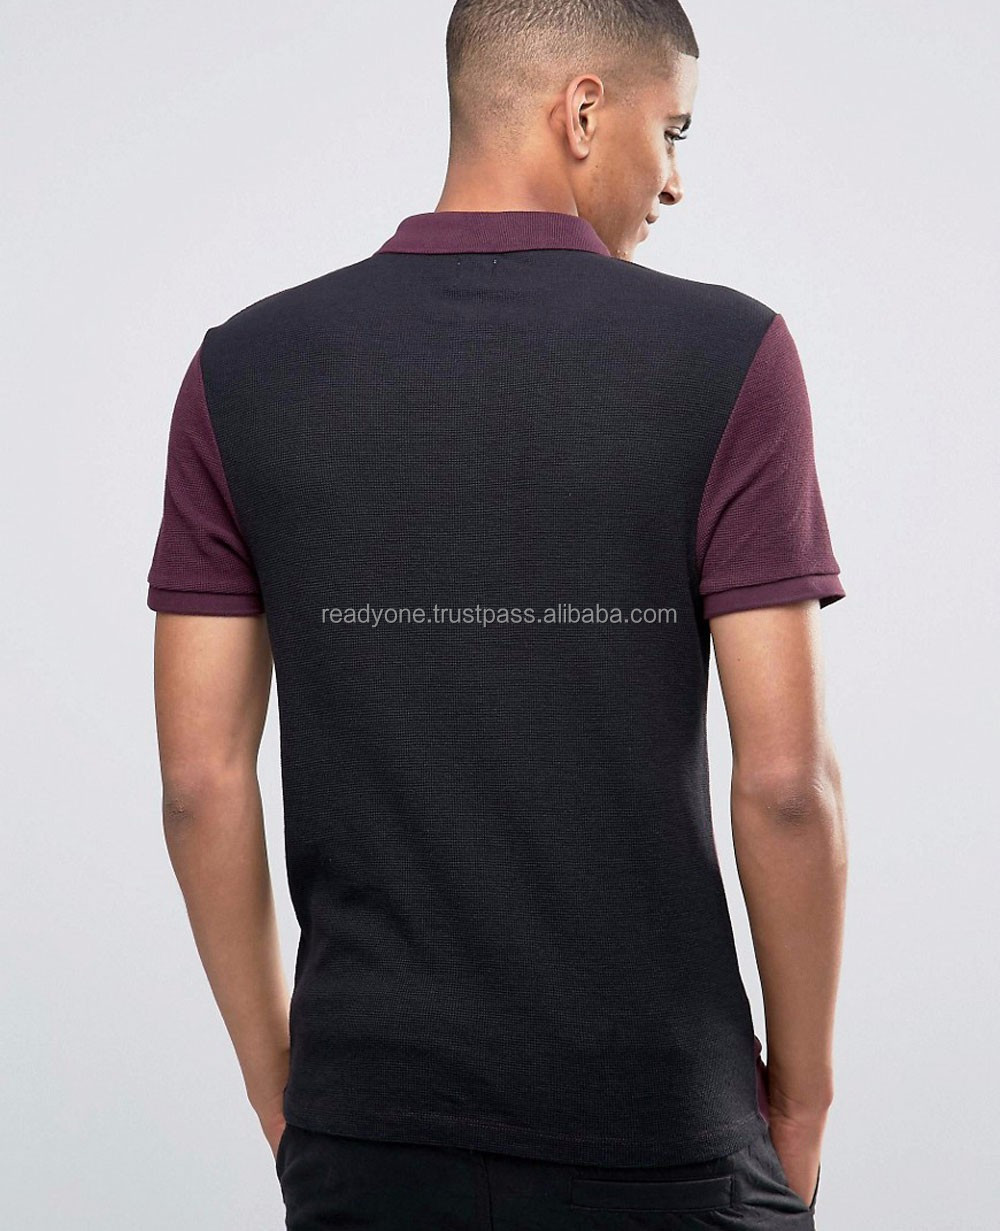 Custom golf polo t shirt wholesale mens sublimated 100 for Golf shirt vs polo shirt